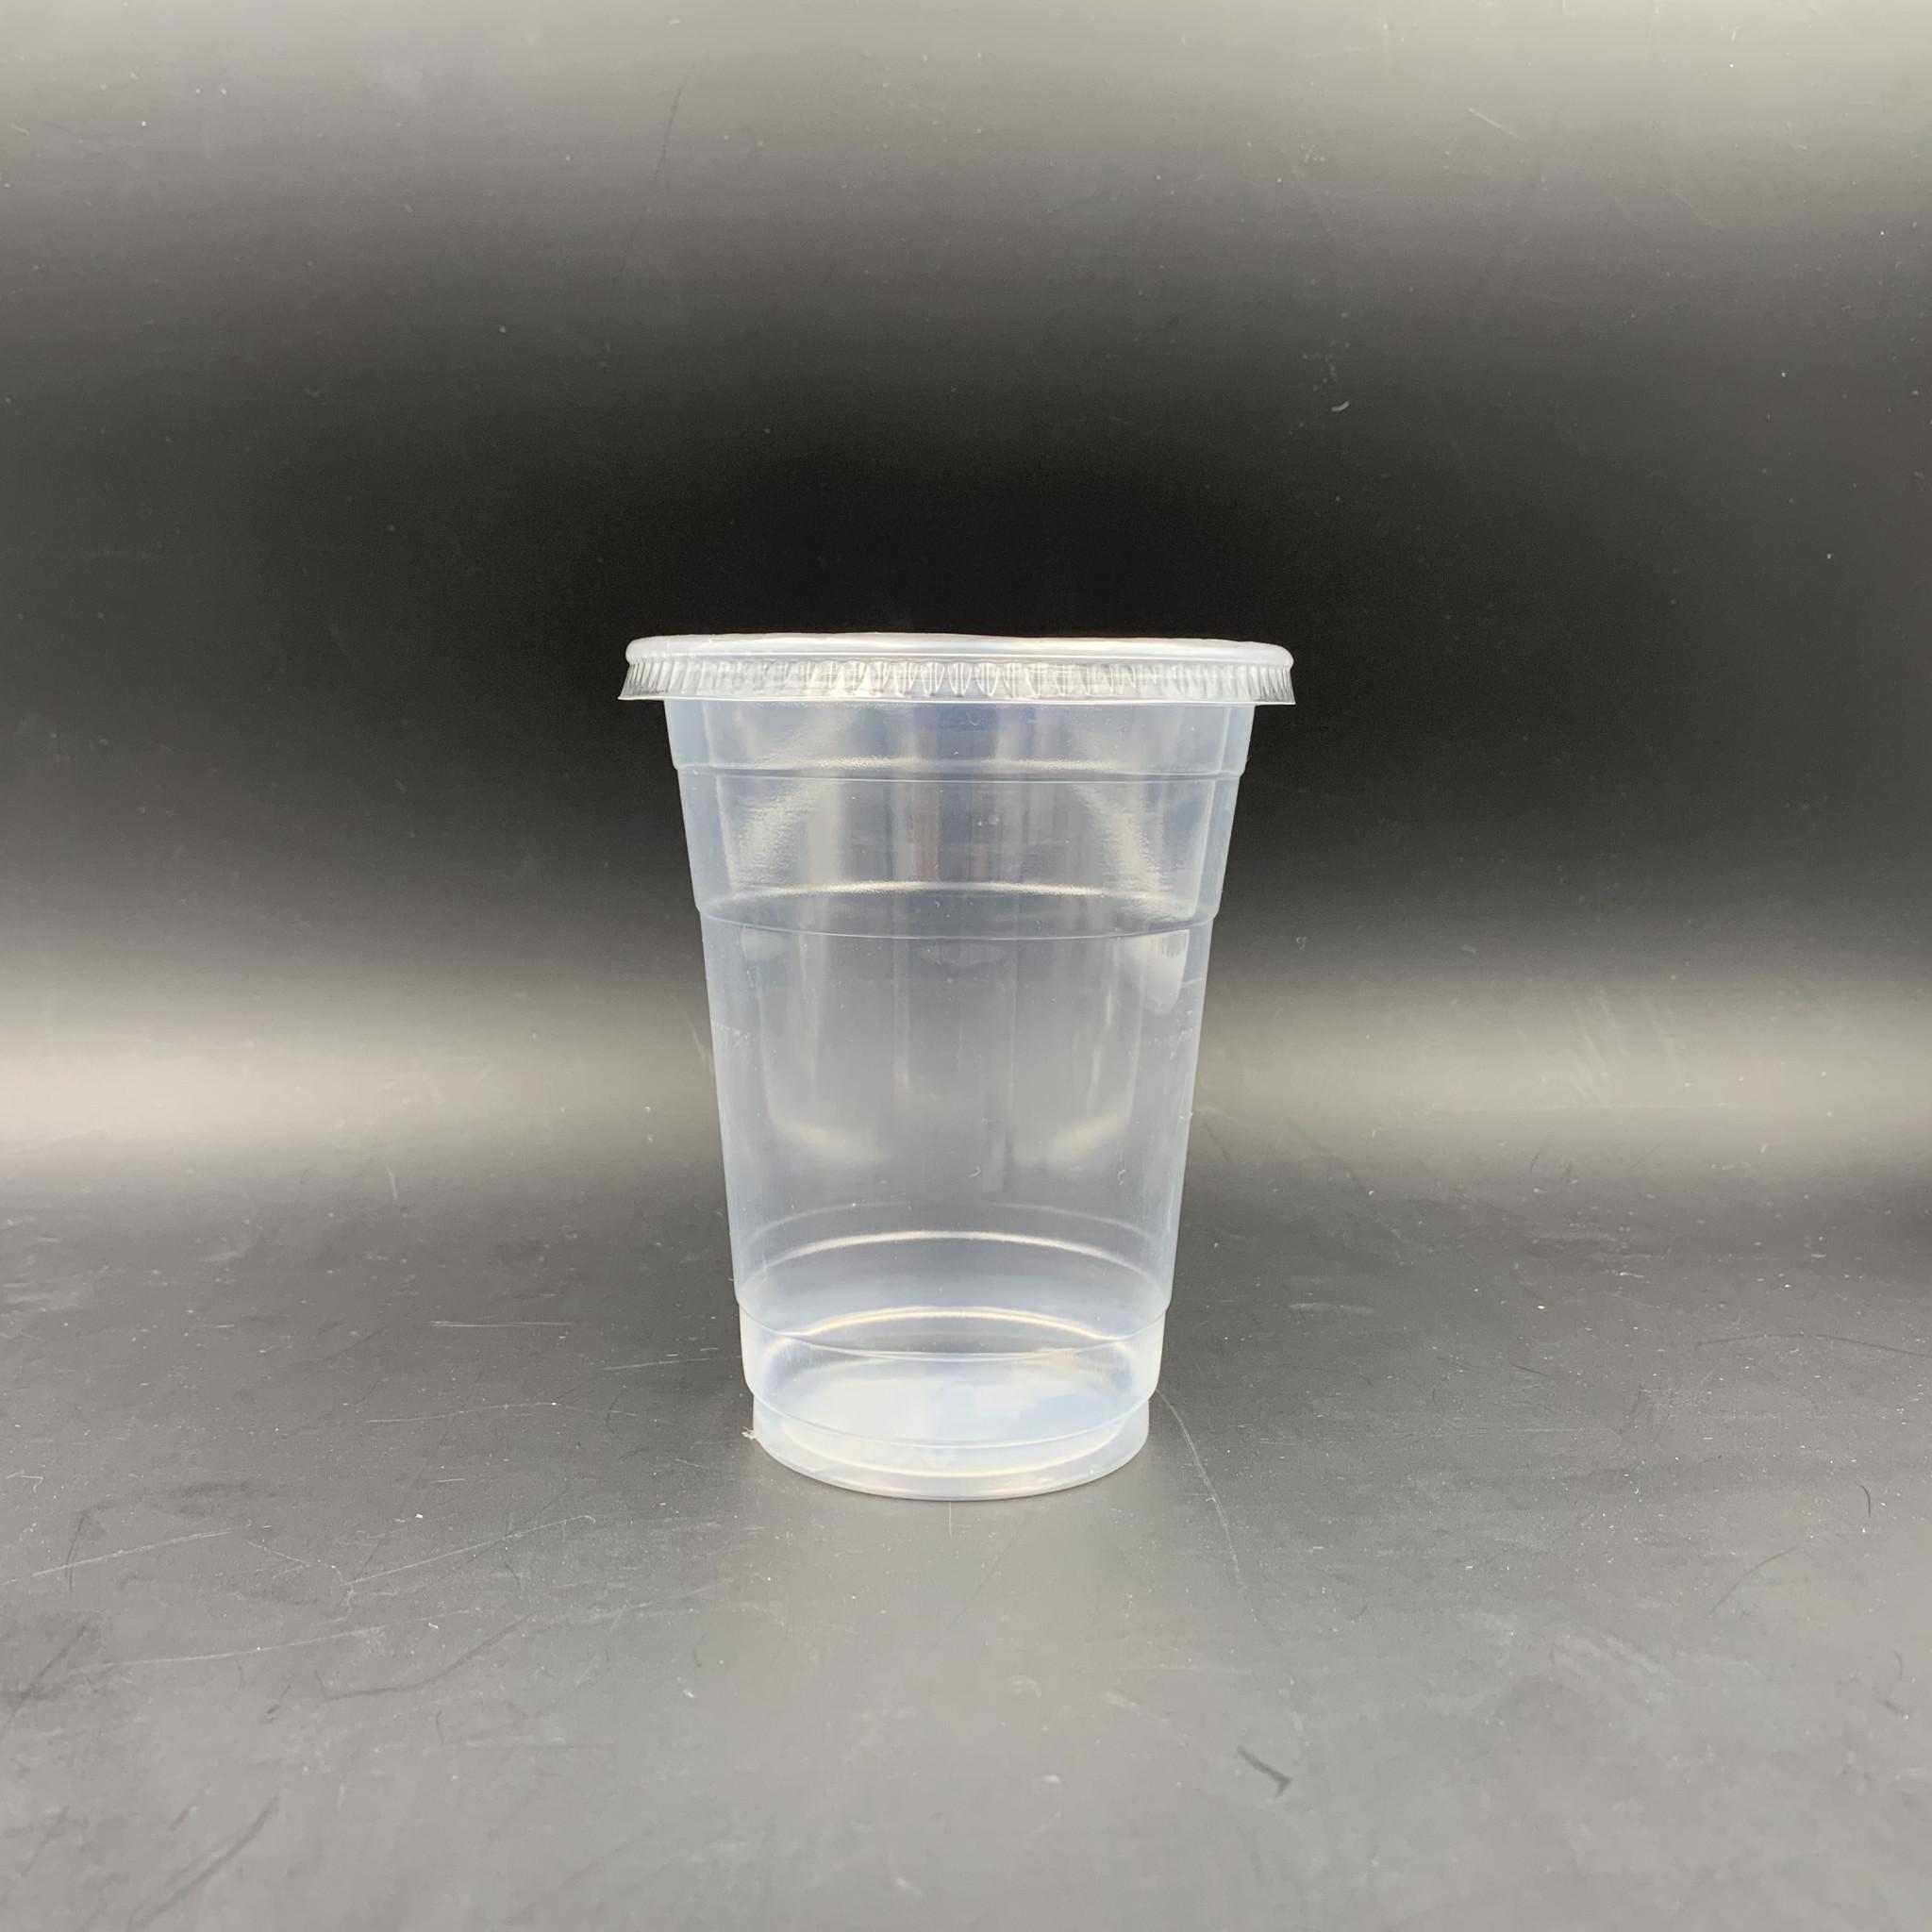 16安士透明PP膠杯